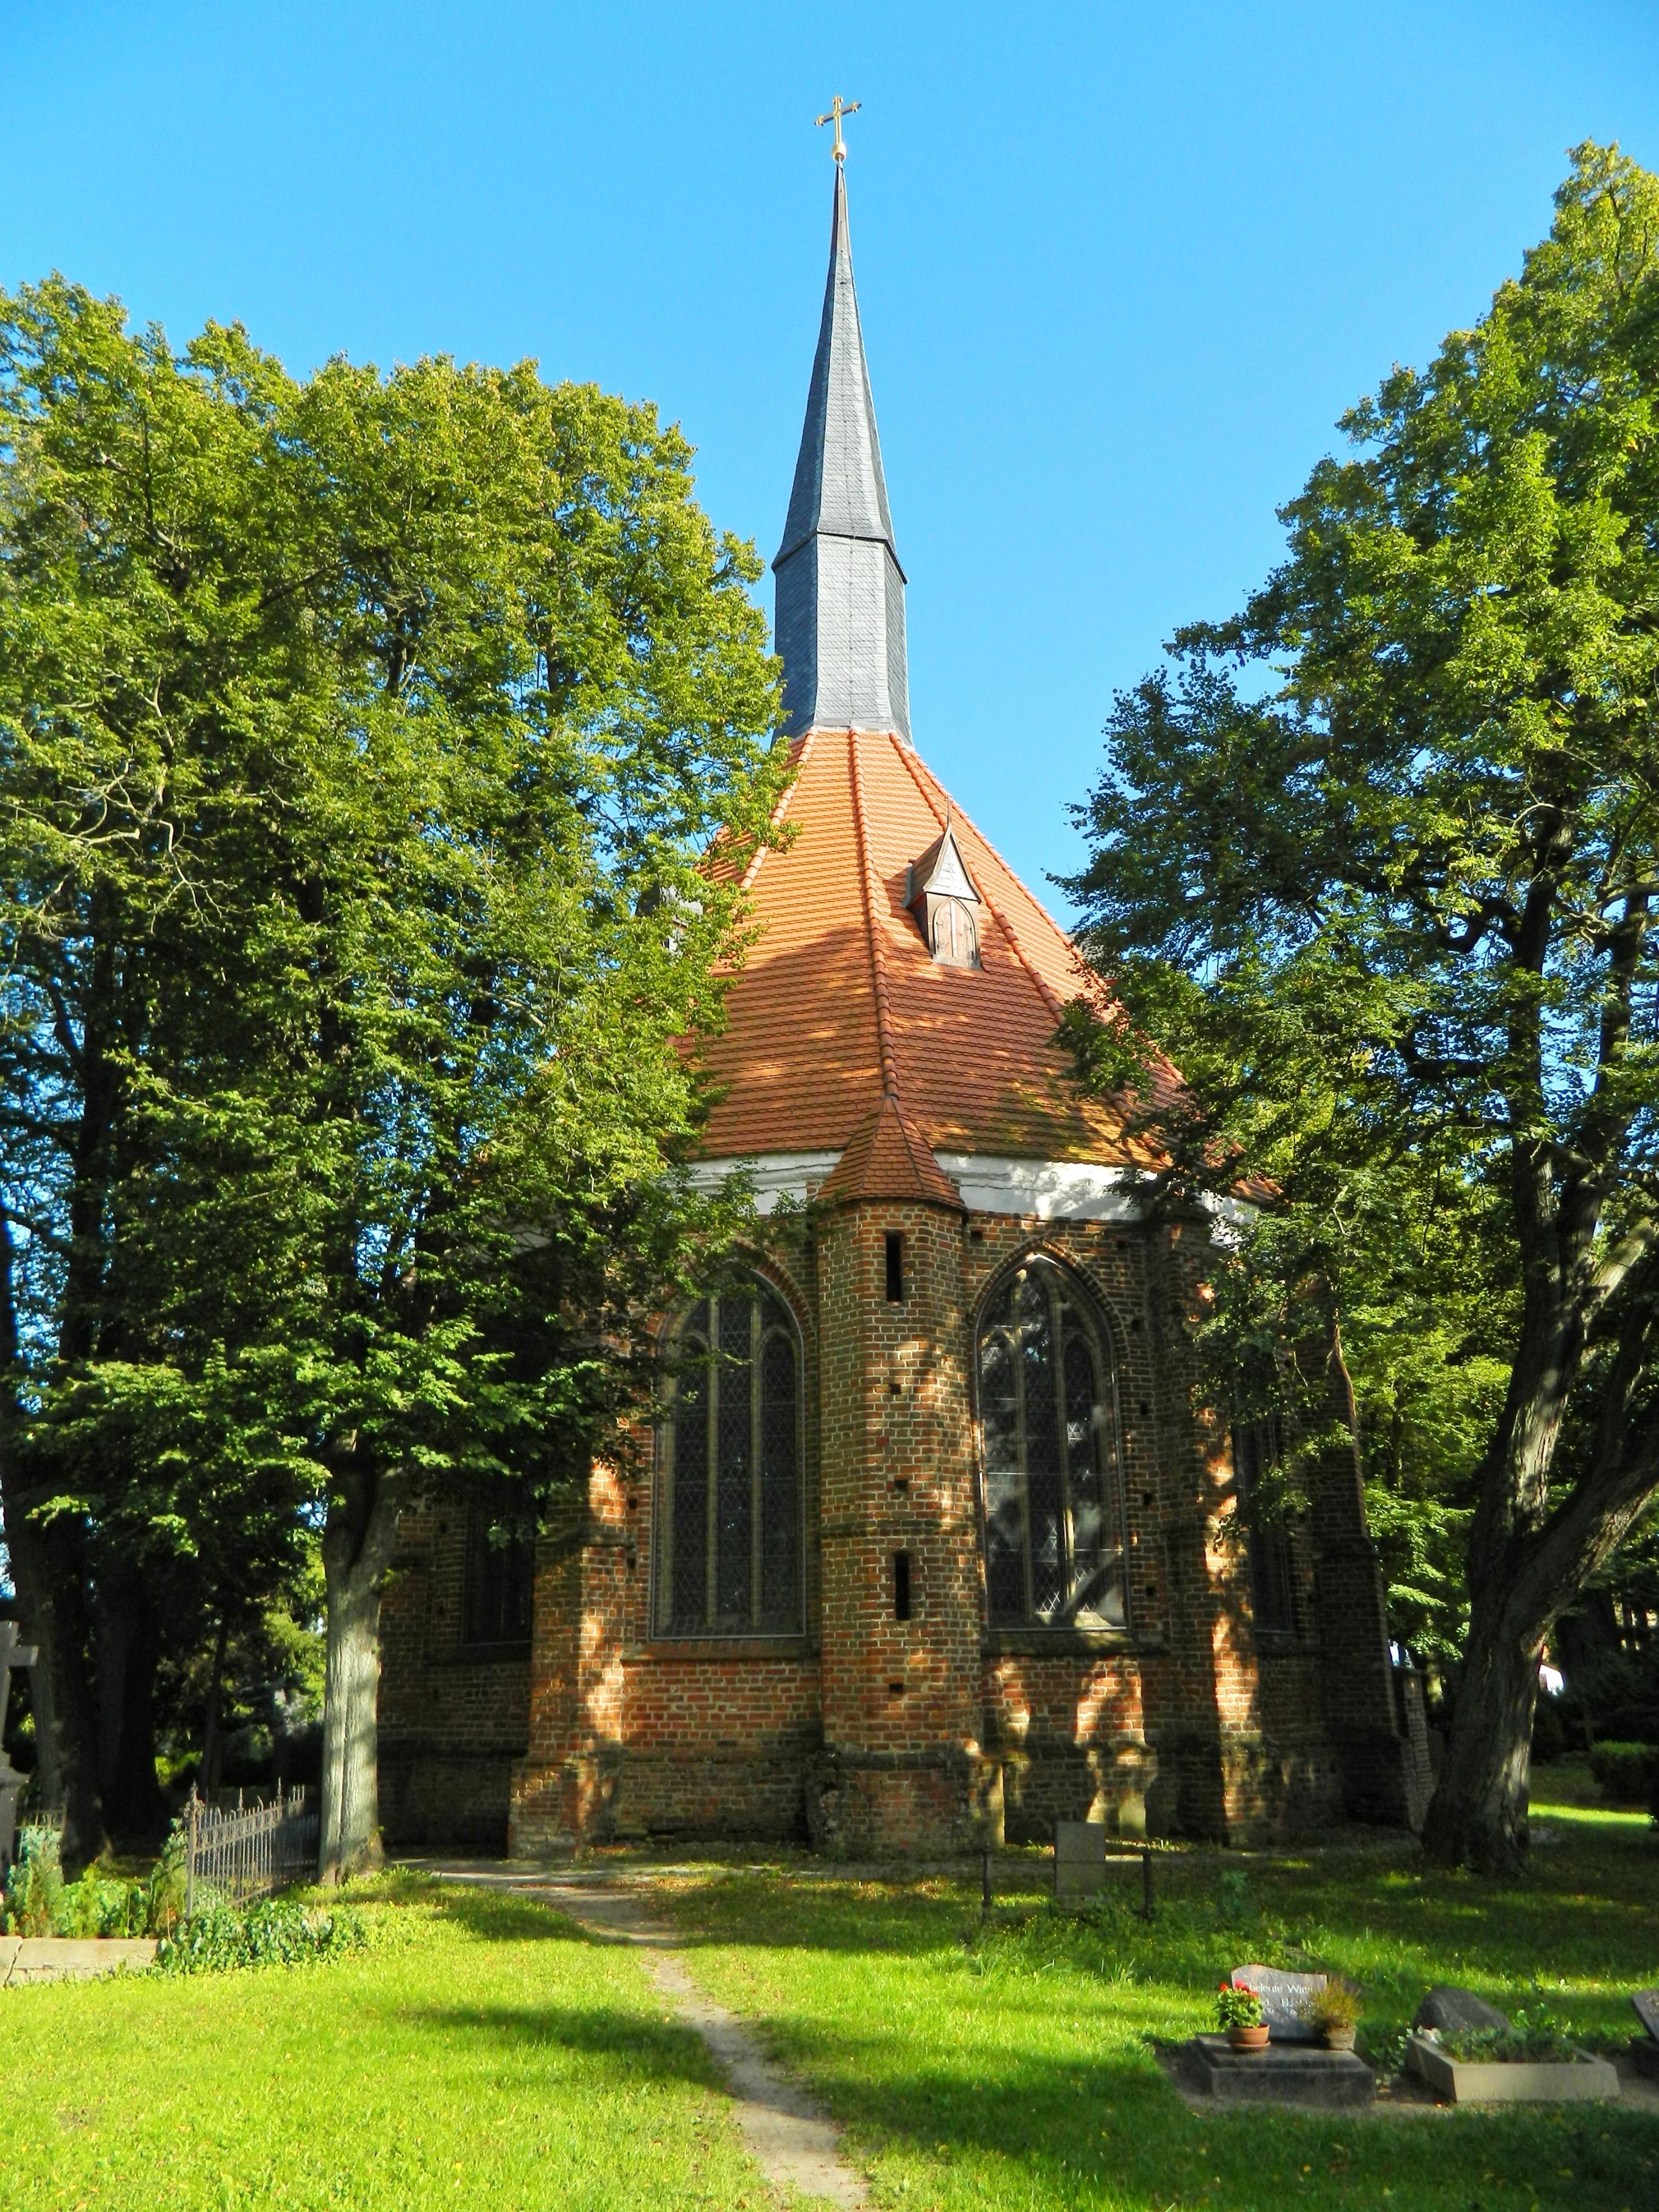 Wolgast, Mecklenburg-West Pomerania, Germany